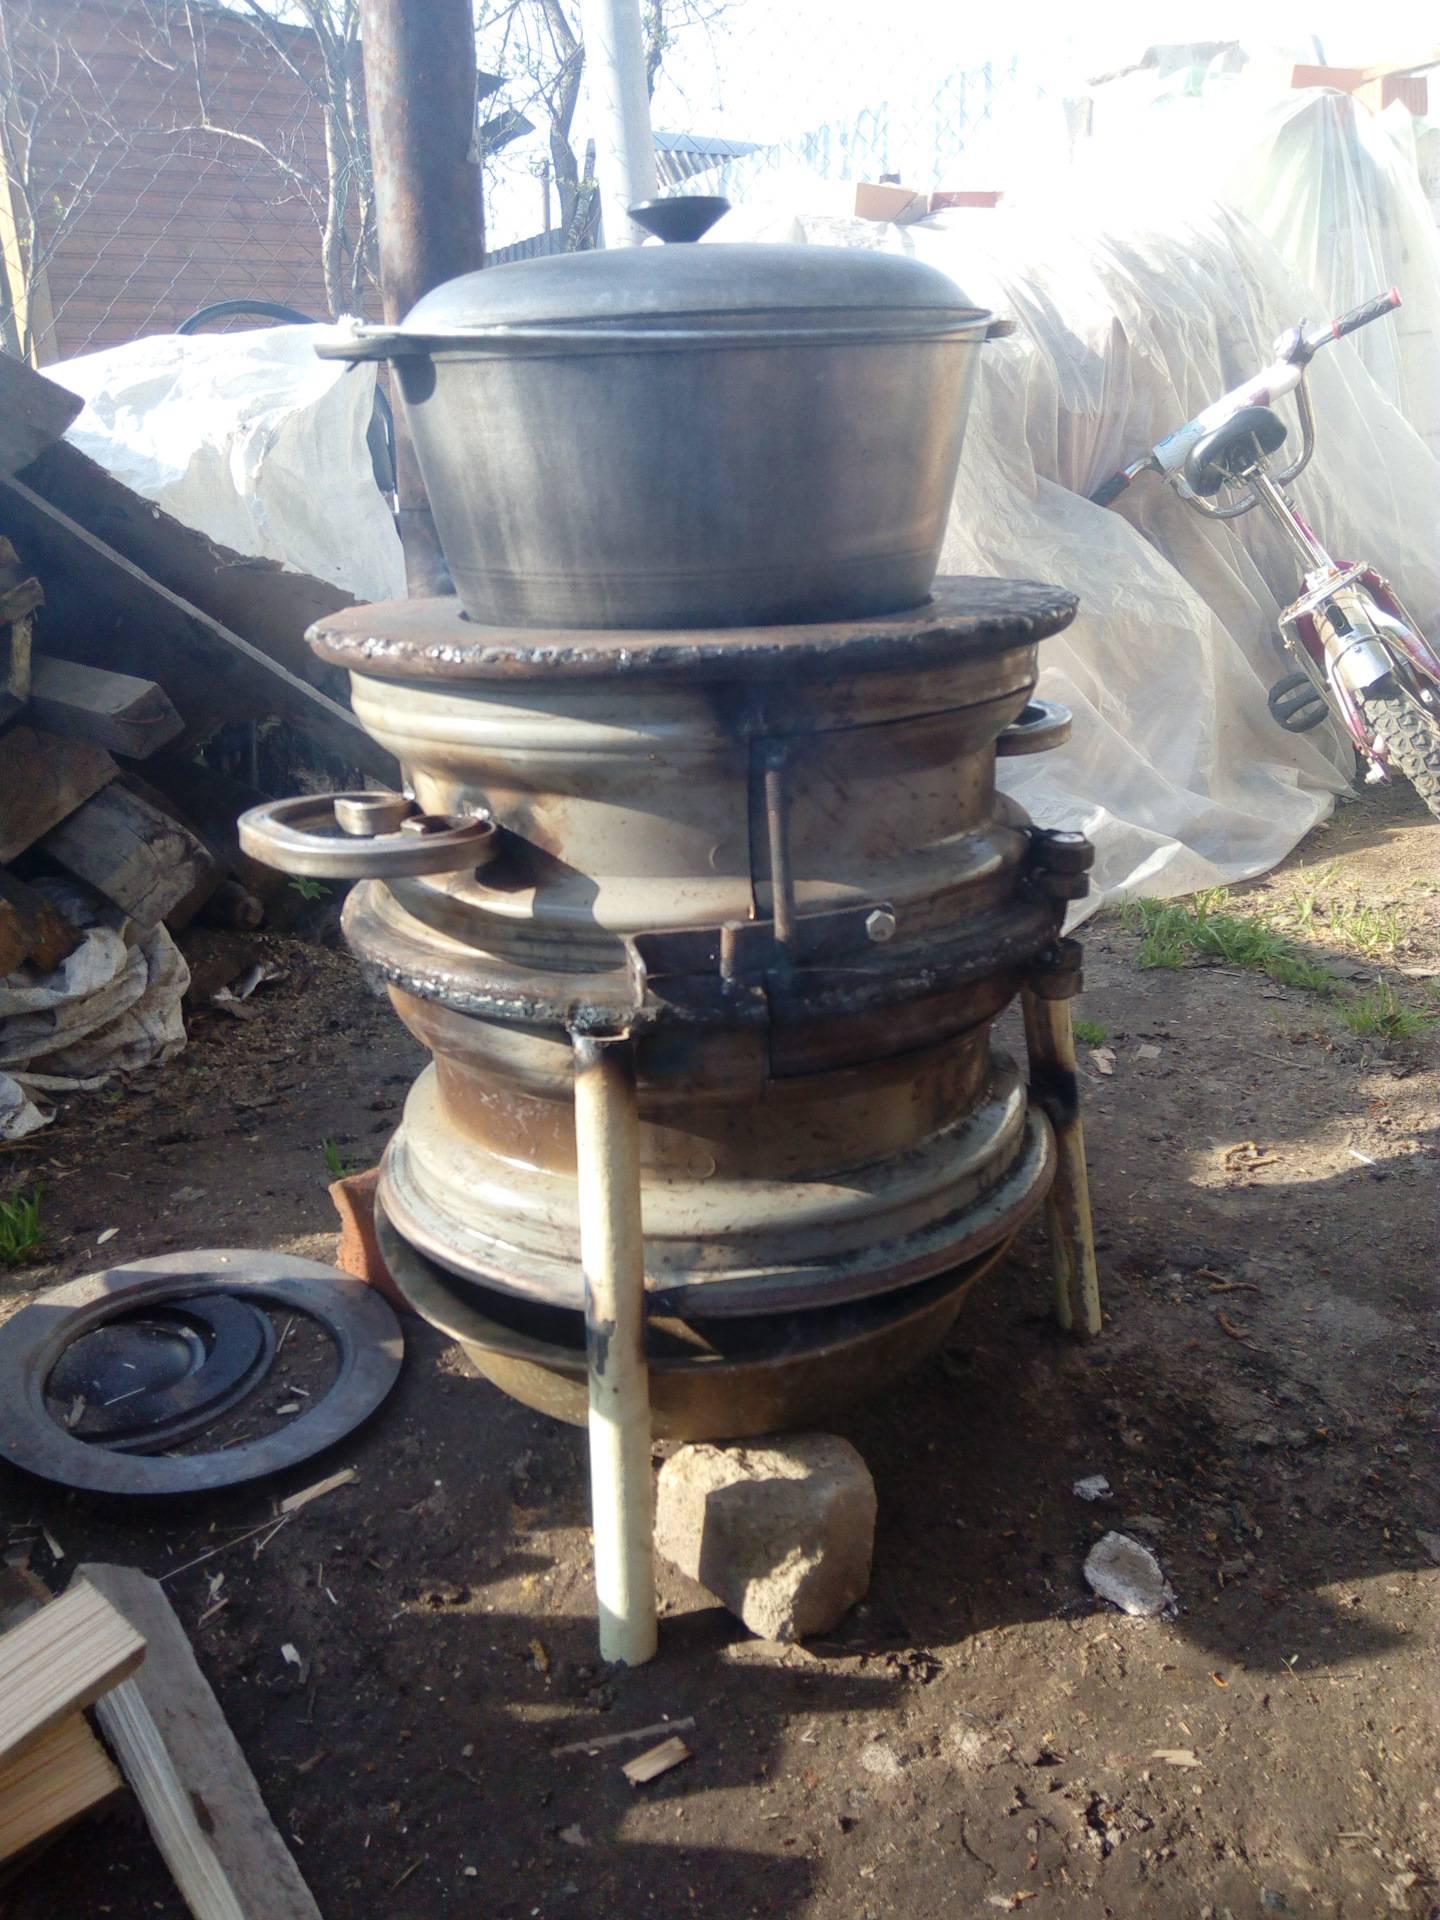 Печка из камазовских дисков своими руками - moy-instrument.ru - обзор инструмента и техники